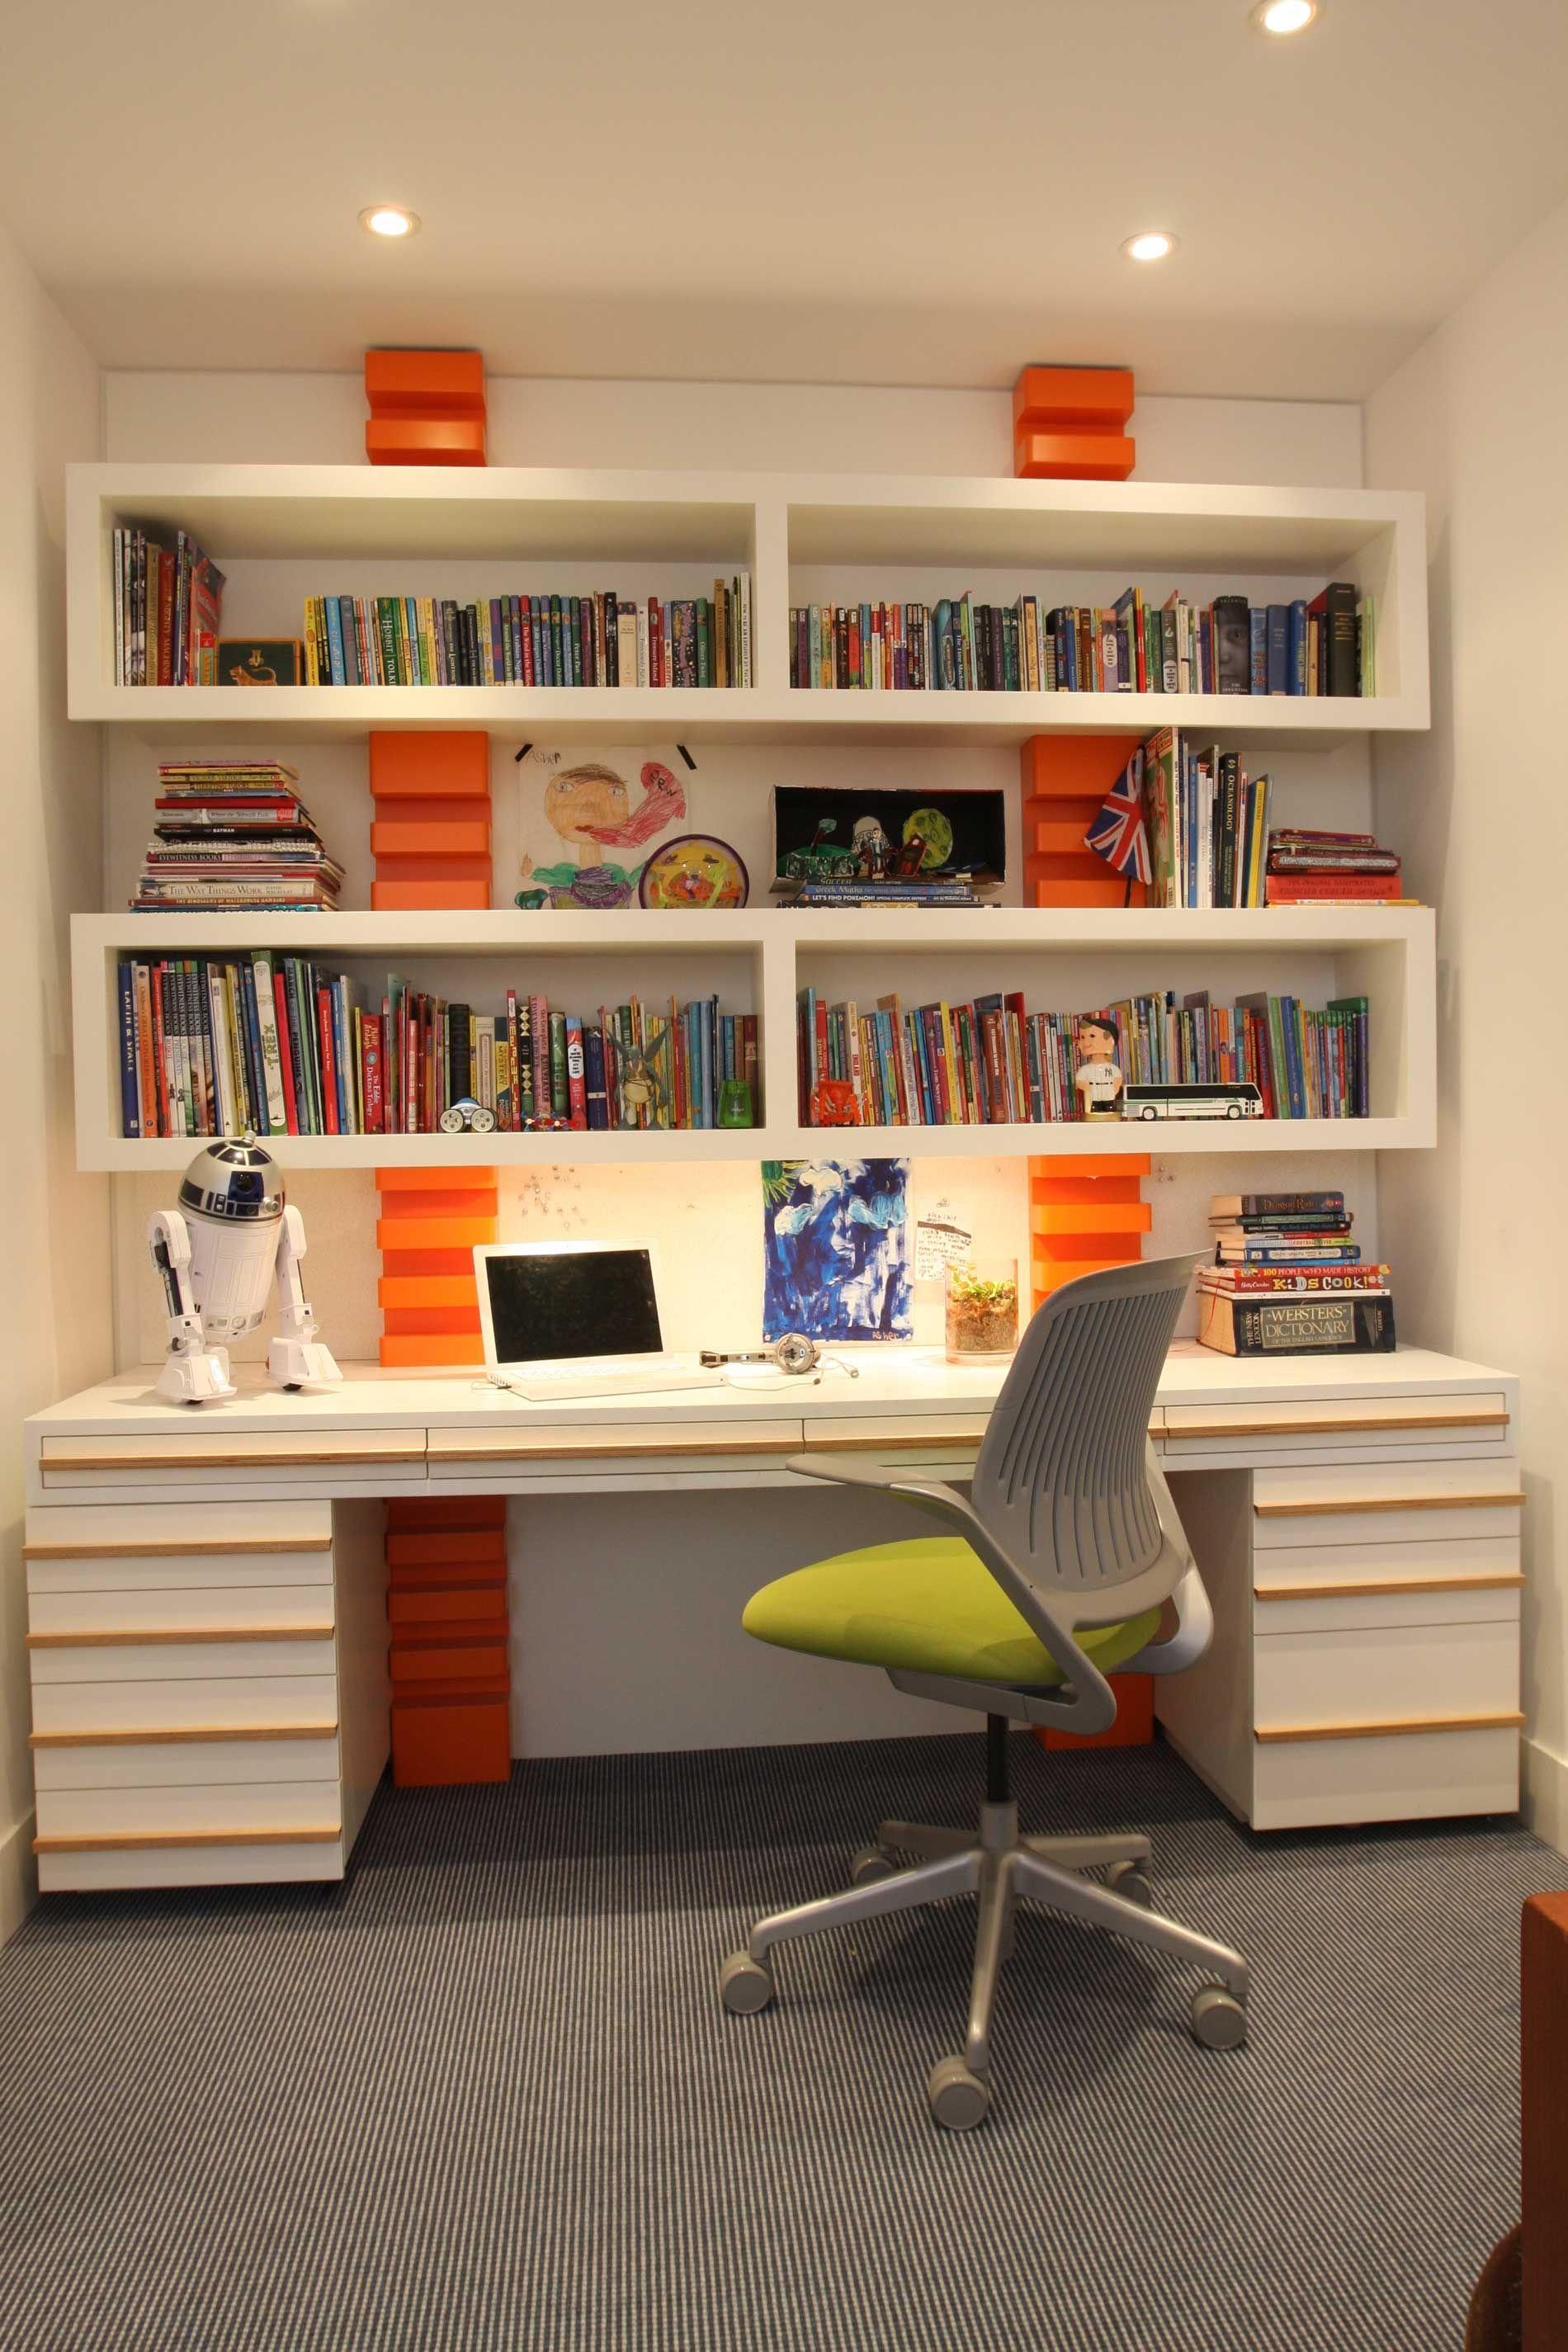 43 very inspiring and creative bookshelf decorating ideas - Bookshelf ideas for bedroom ...